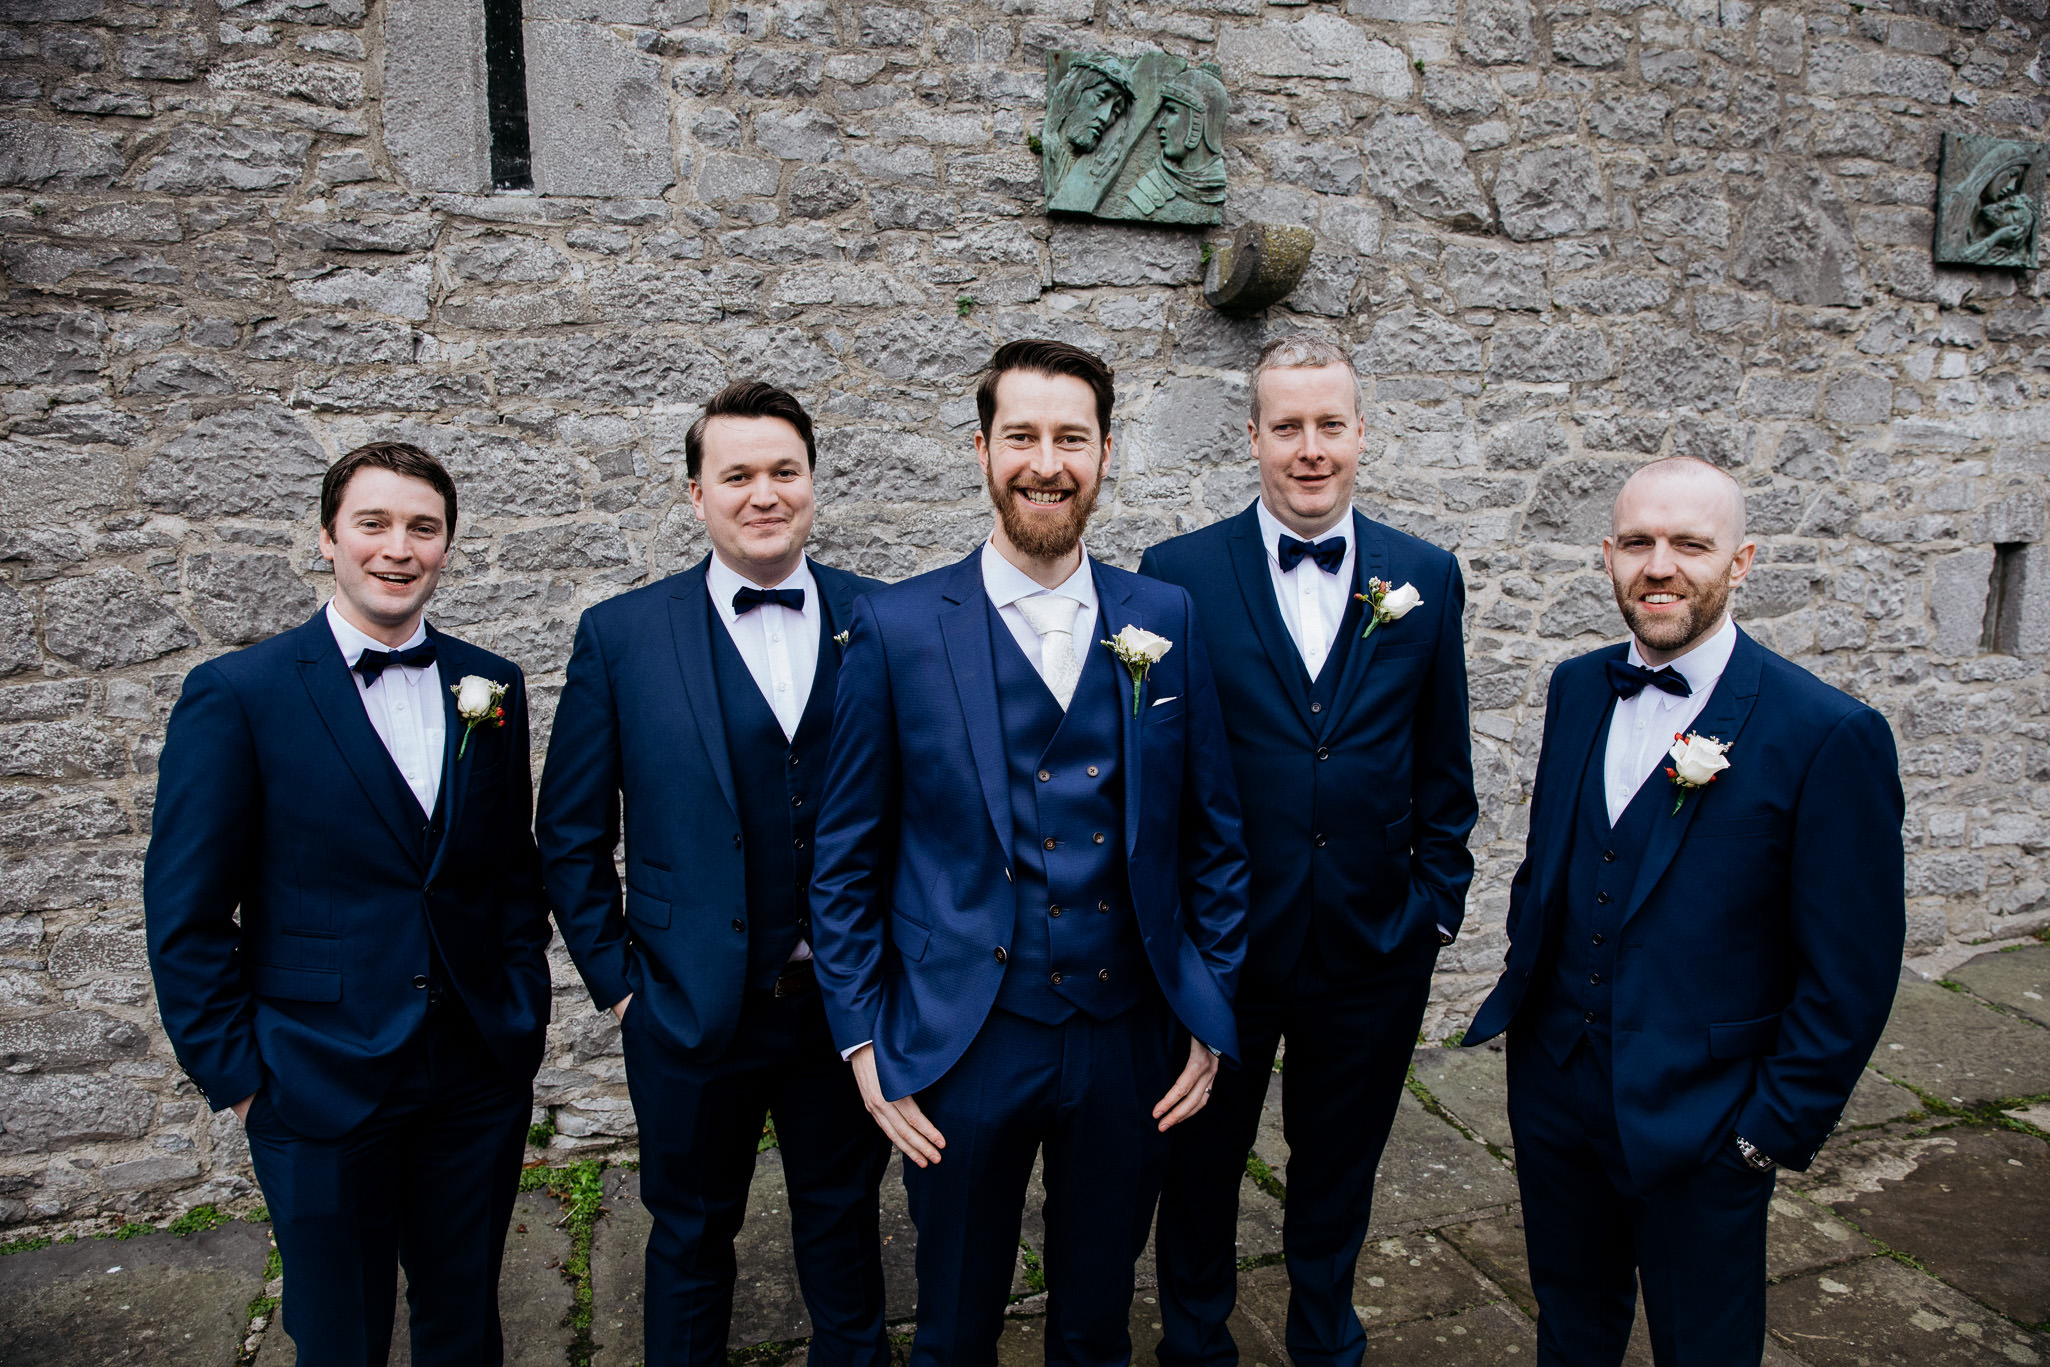 clairebyrnephotography-wedding-night-sparklers-new-years-eve-denyce-leonard-14.jpg